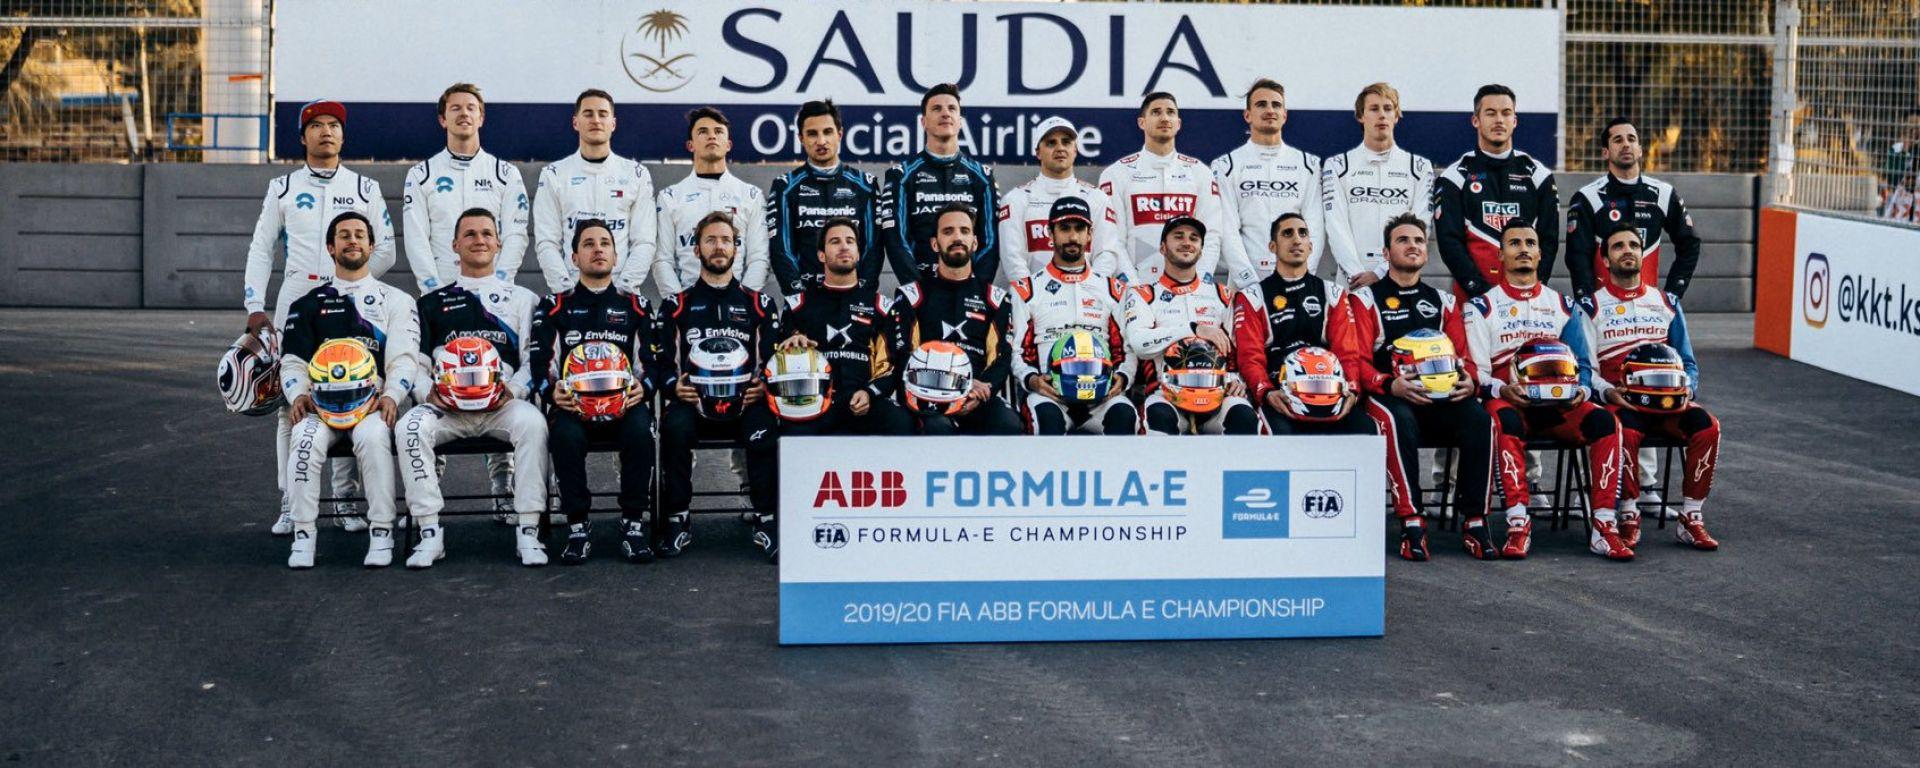 Formula E 2019-2020, ePrix Ad Diriyah: tutti i piloti partecipanti alla season 6